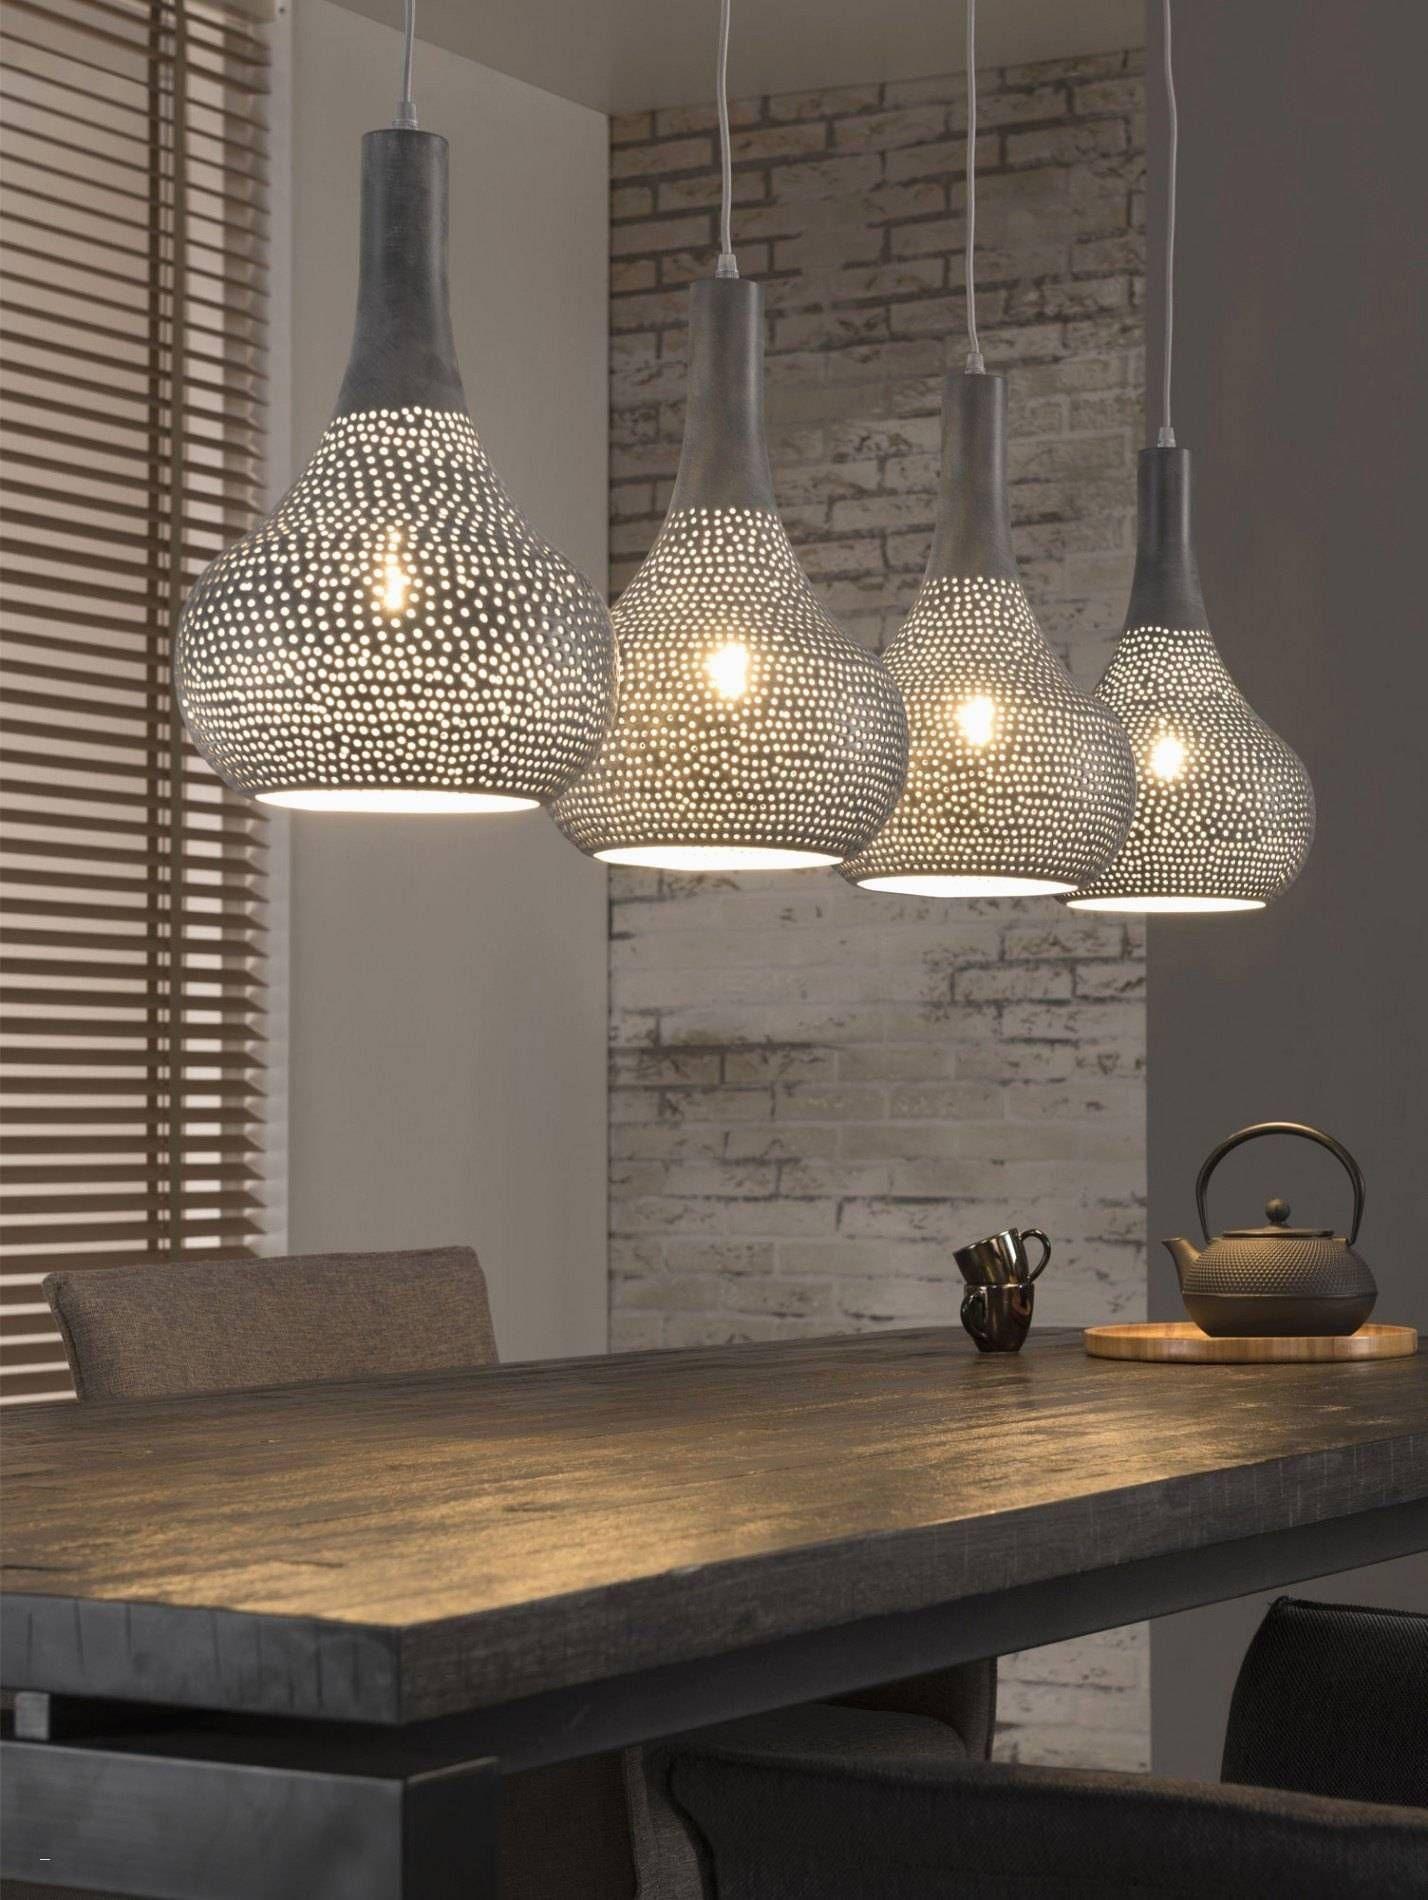 Schon Wohnzimmer Lampe Poco Inspirationen Lampen Hanging Lamp Lamp Interior Lighting